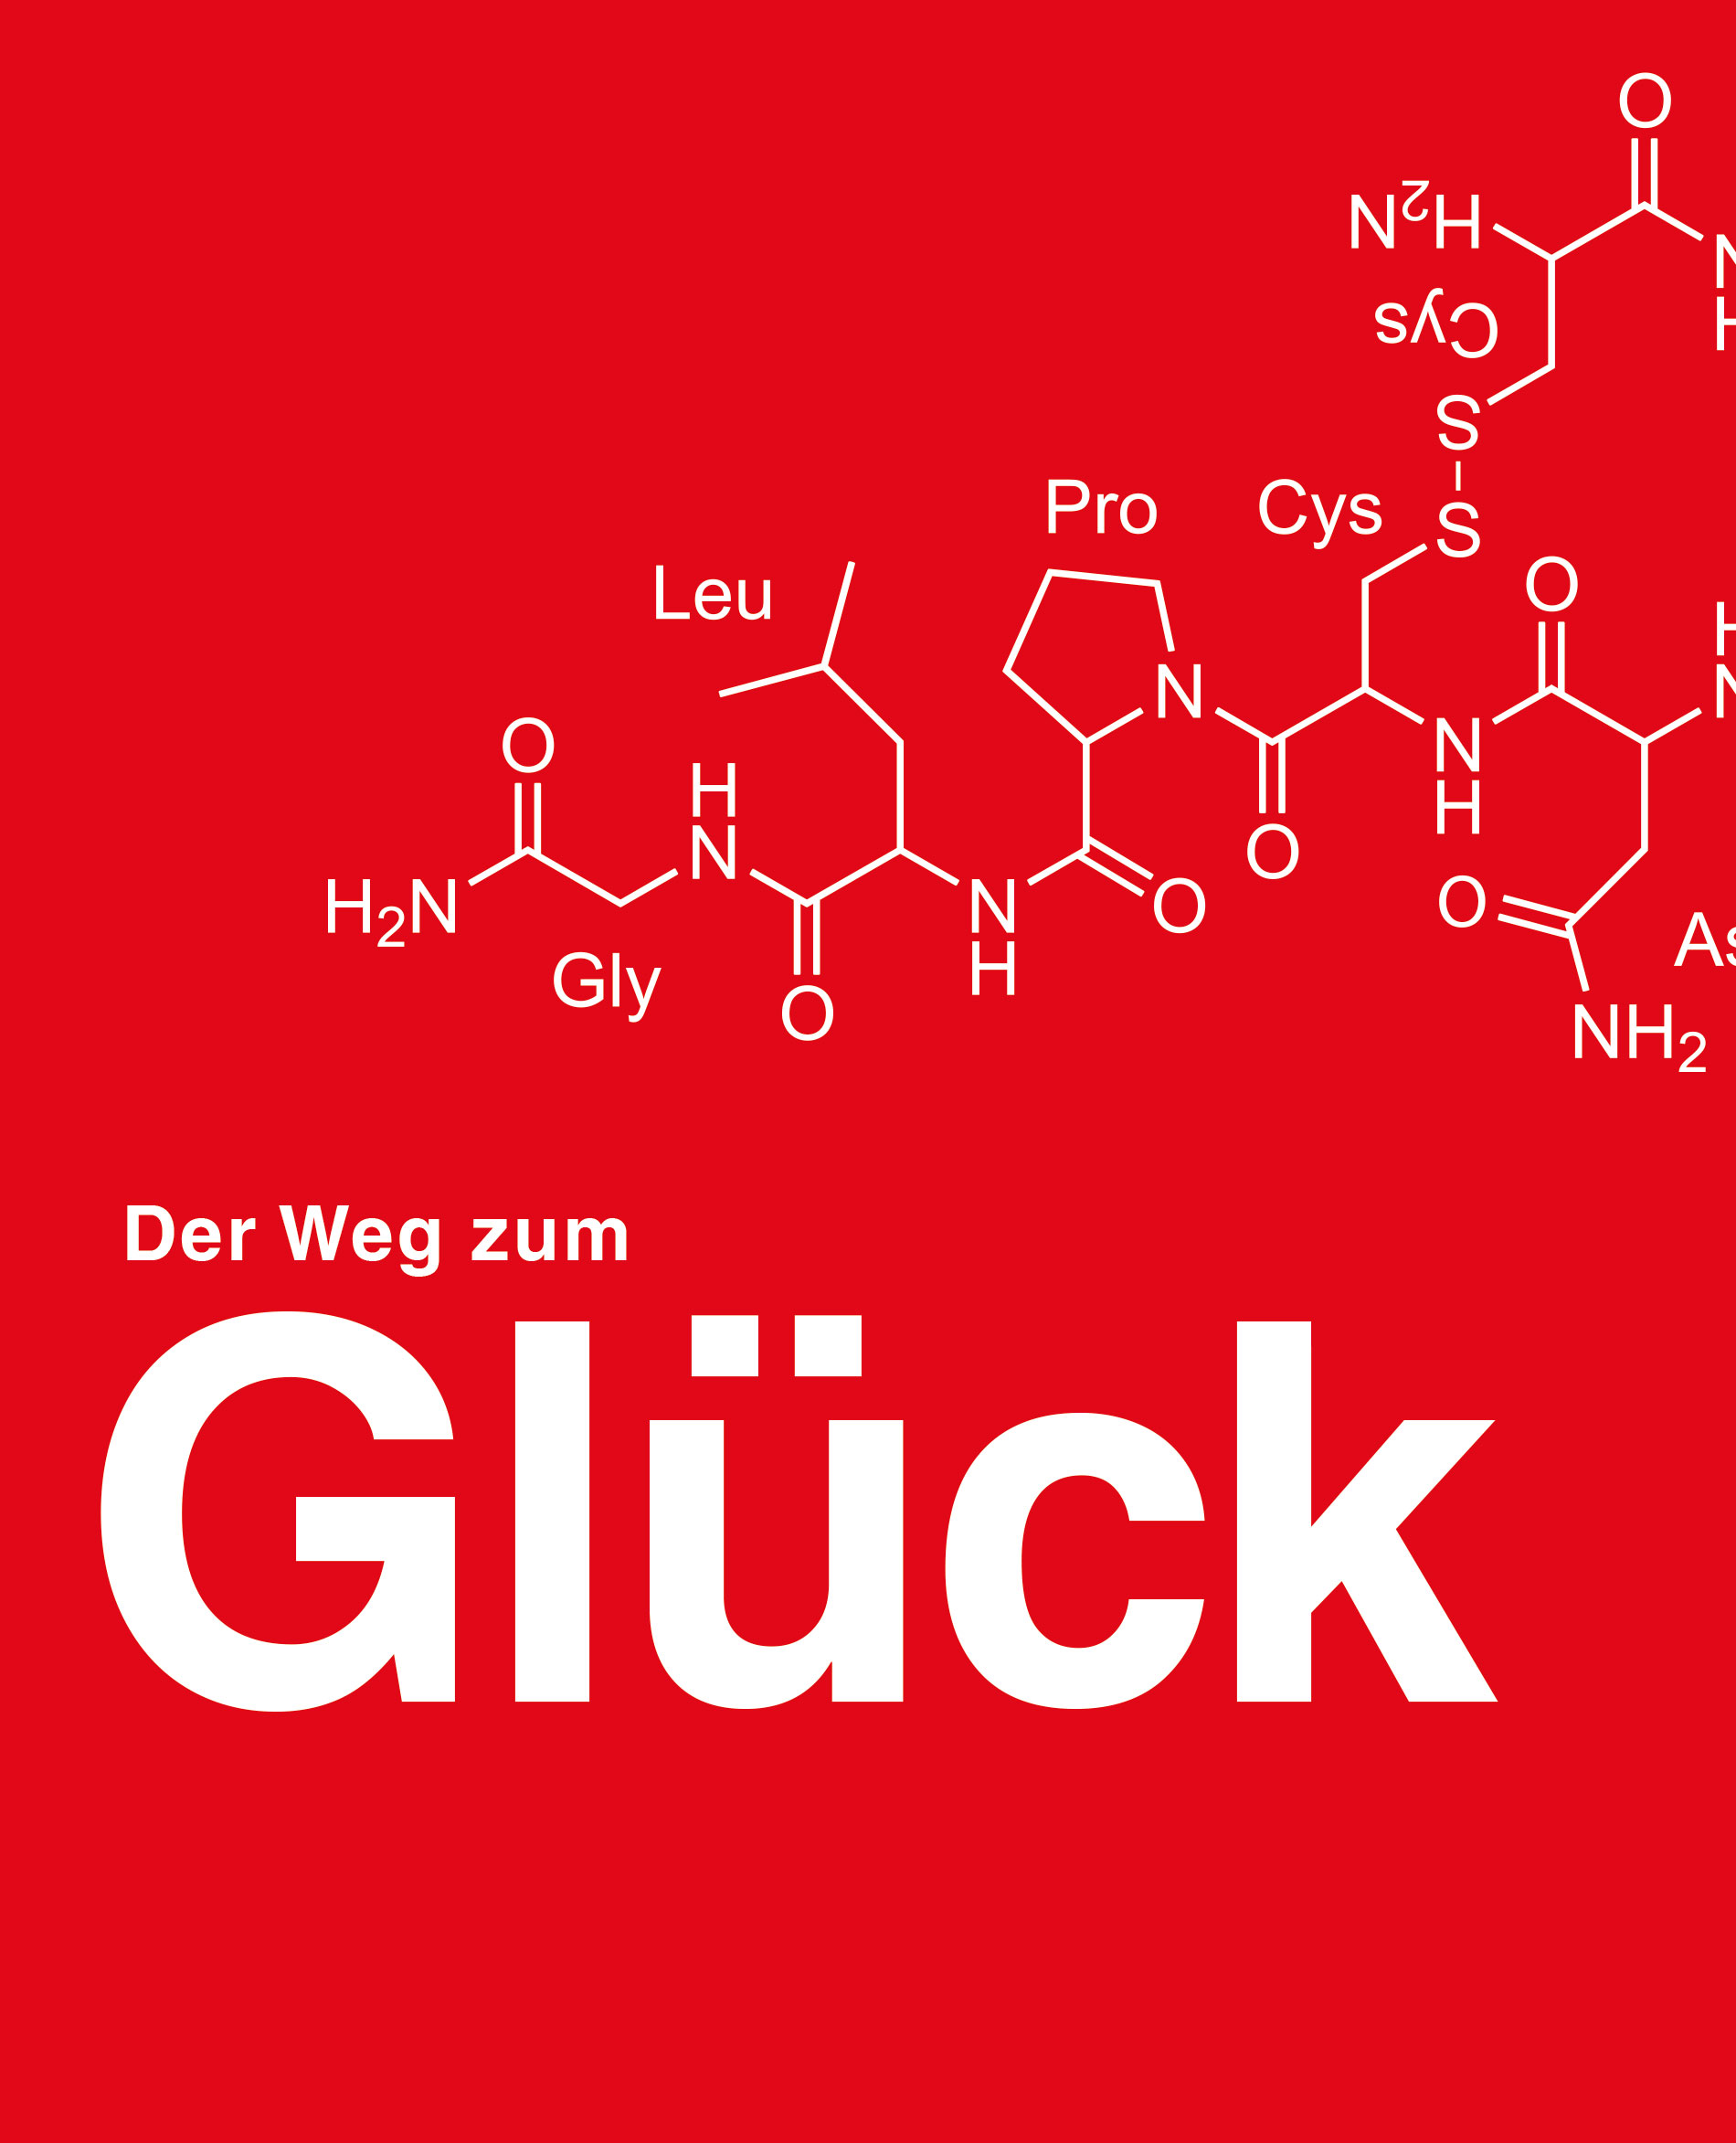 Carl-Roth-Der-Weg-zum-Glueck